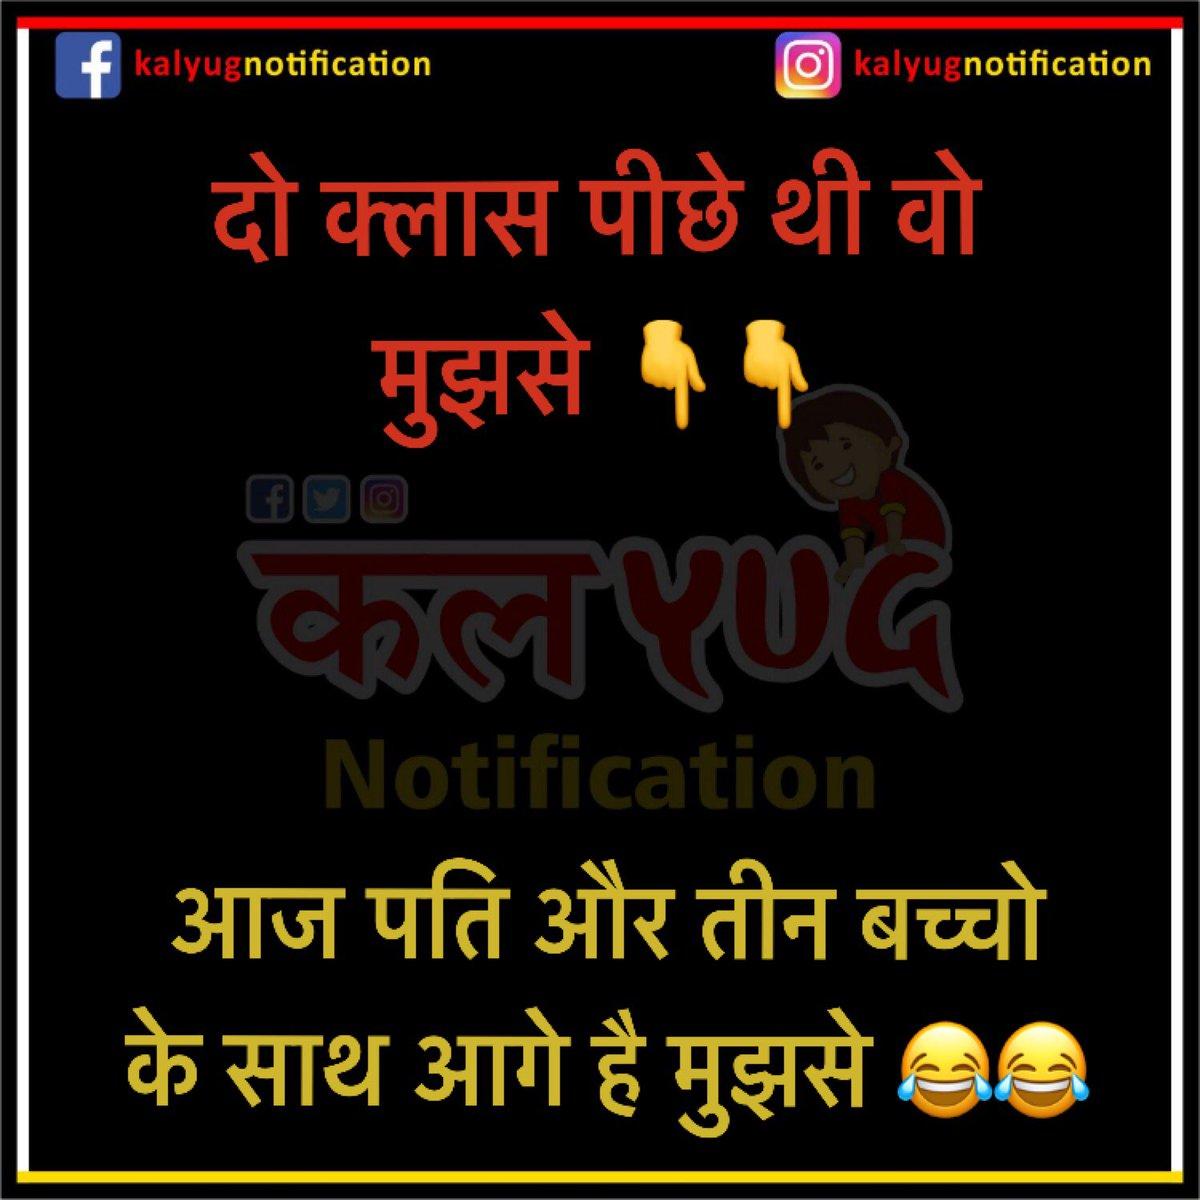 Follow for laughing dose daily  . #jokes #funnyjokes #jokesoftheday #dailyjokes #meme #memes #funnymemes #memedaily #followforfollowback #follow #likeforlikes #newjokes #kalyugnotification #ipl #ipl2020 #cid #cidjokes #cidfunnyjokes #cidmemes #ciddaya #girl #boy #feelingfunnypic.twitter.com/THo7Lnn2oY